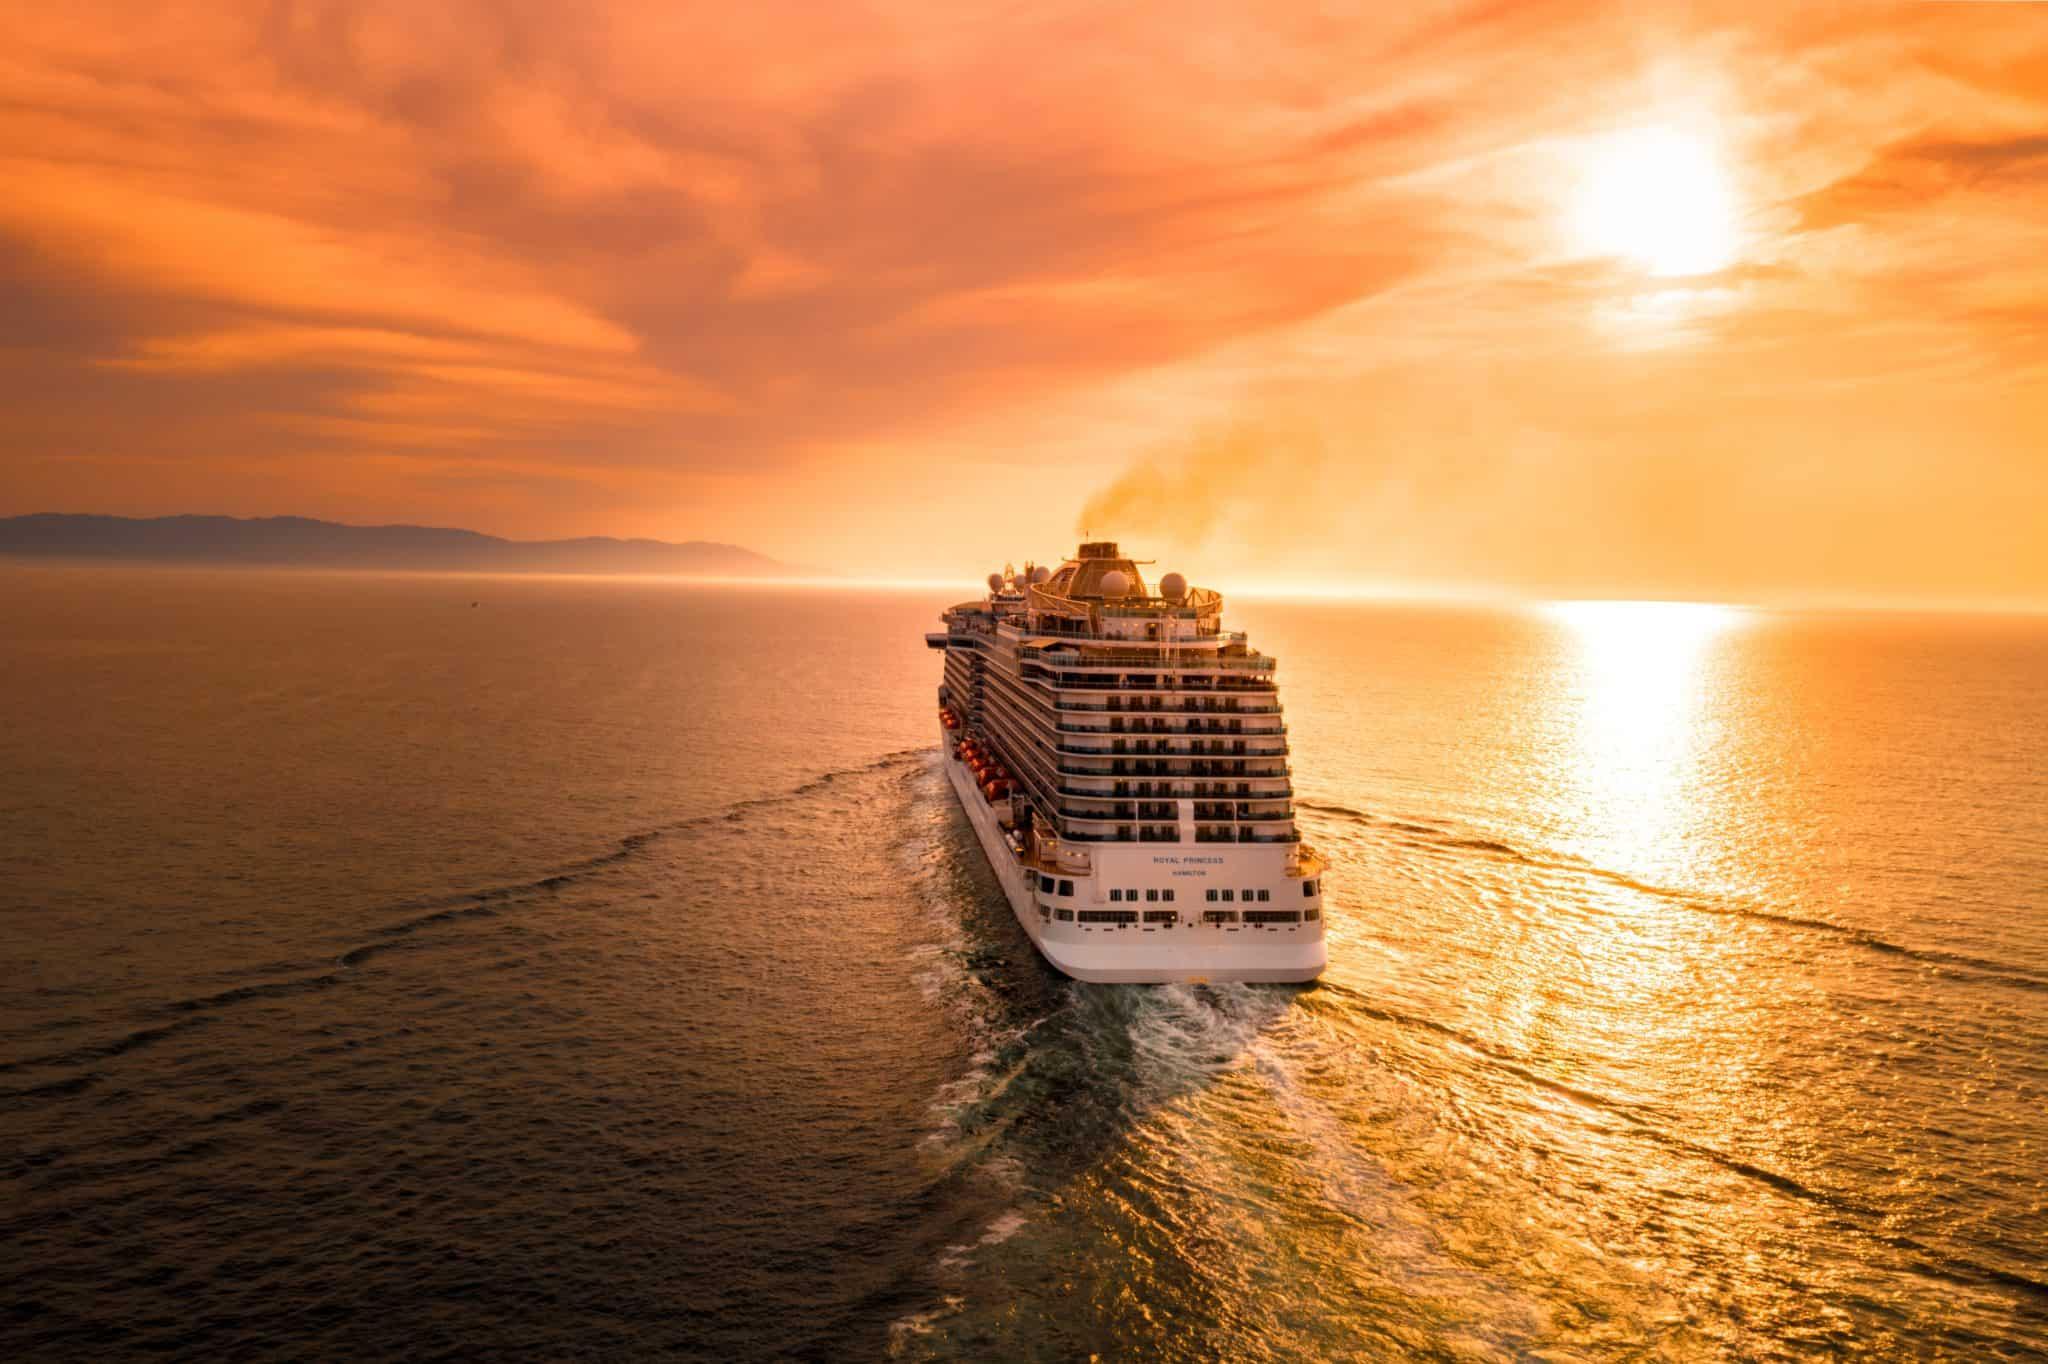 Kreuzfahrt in den Sonnenuntergang